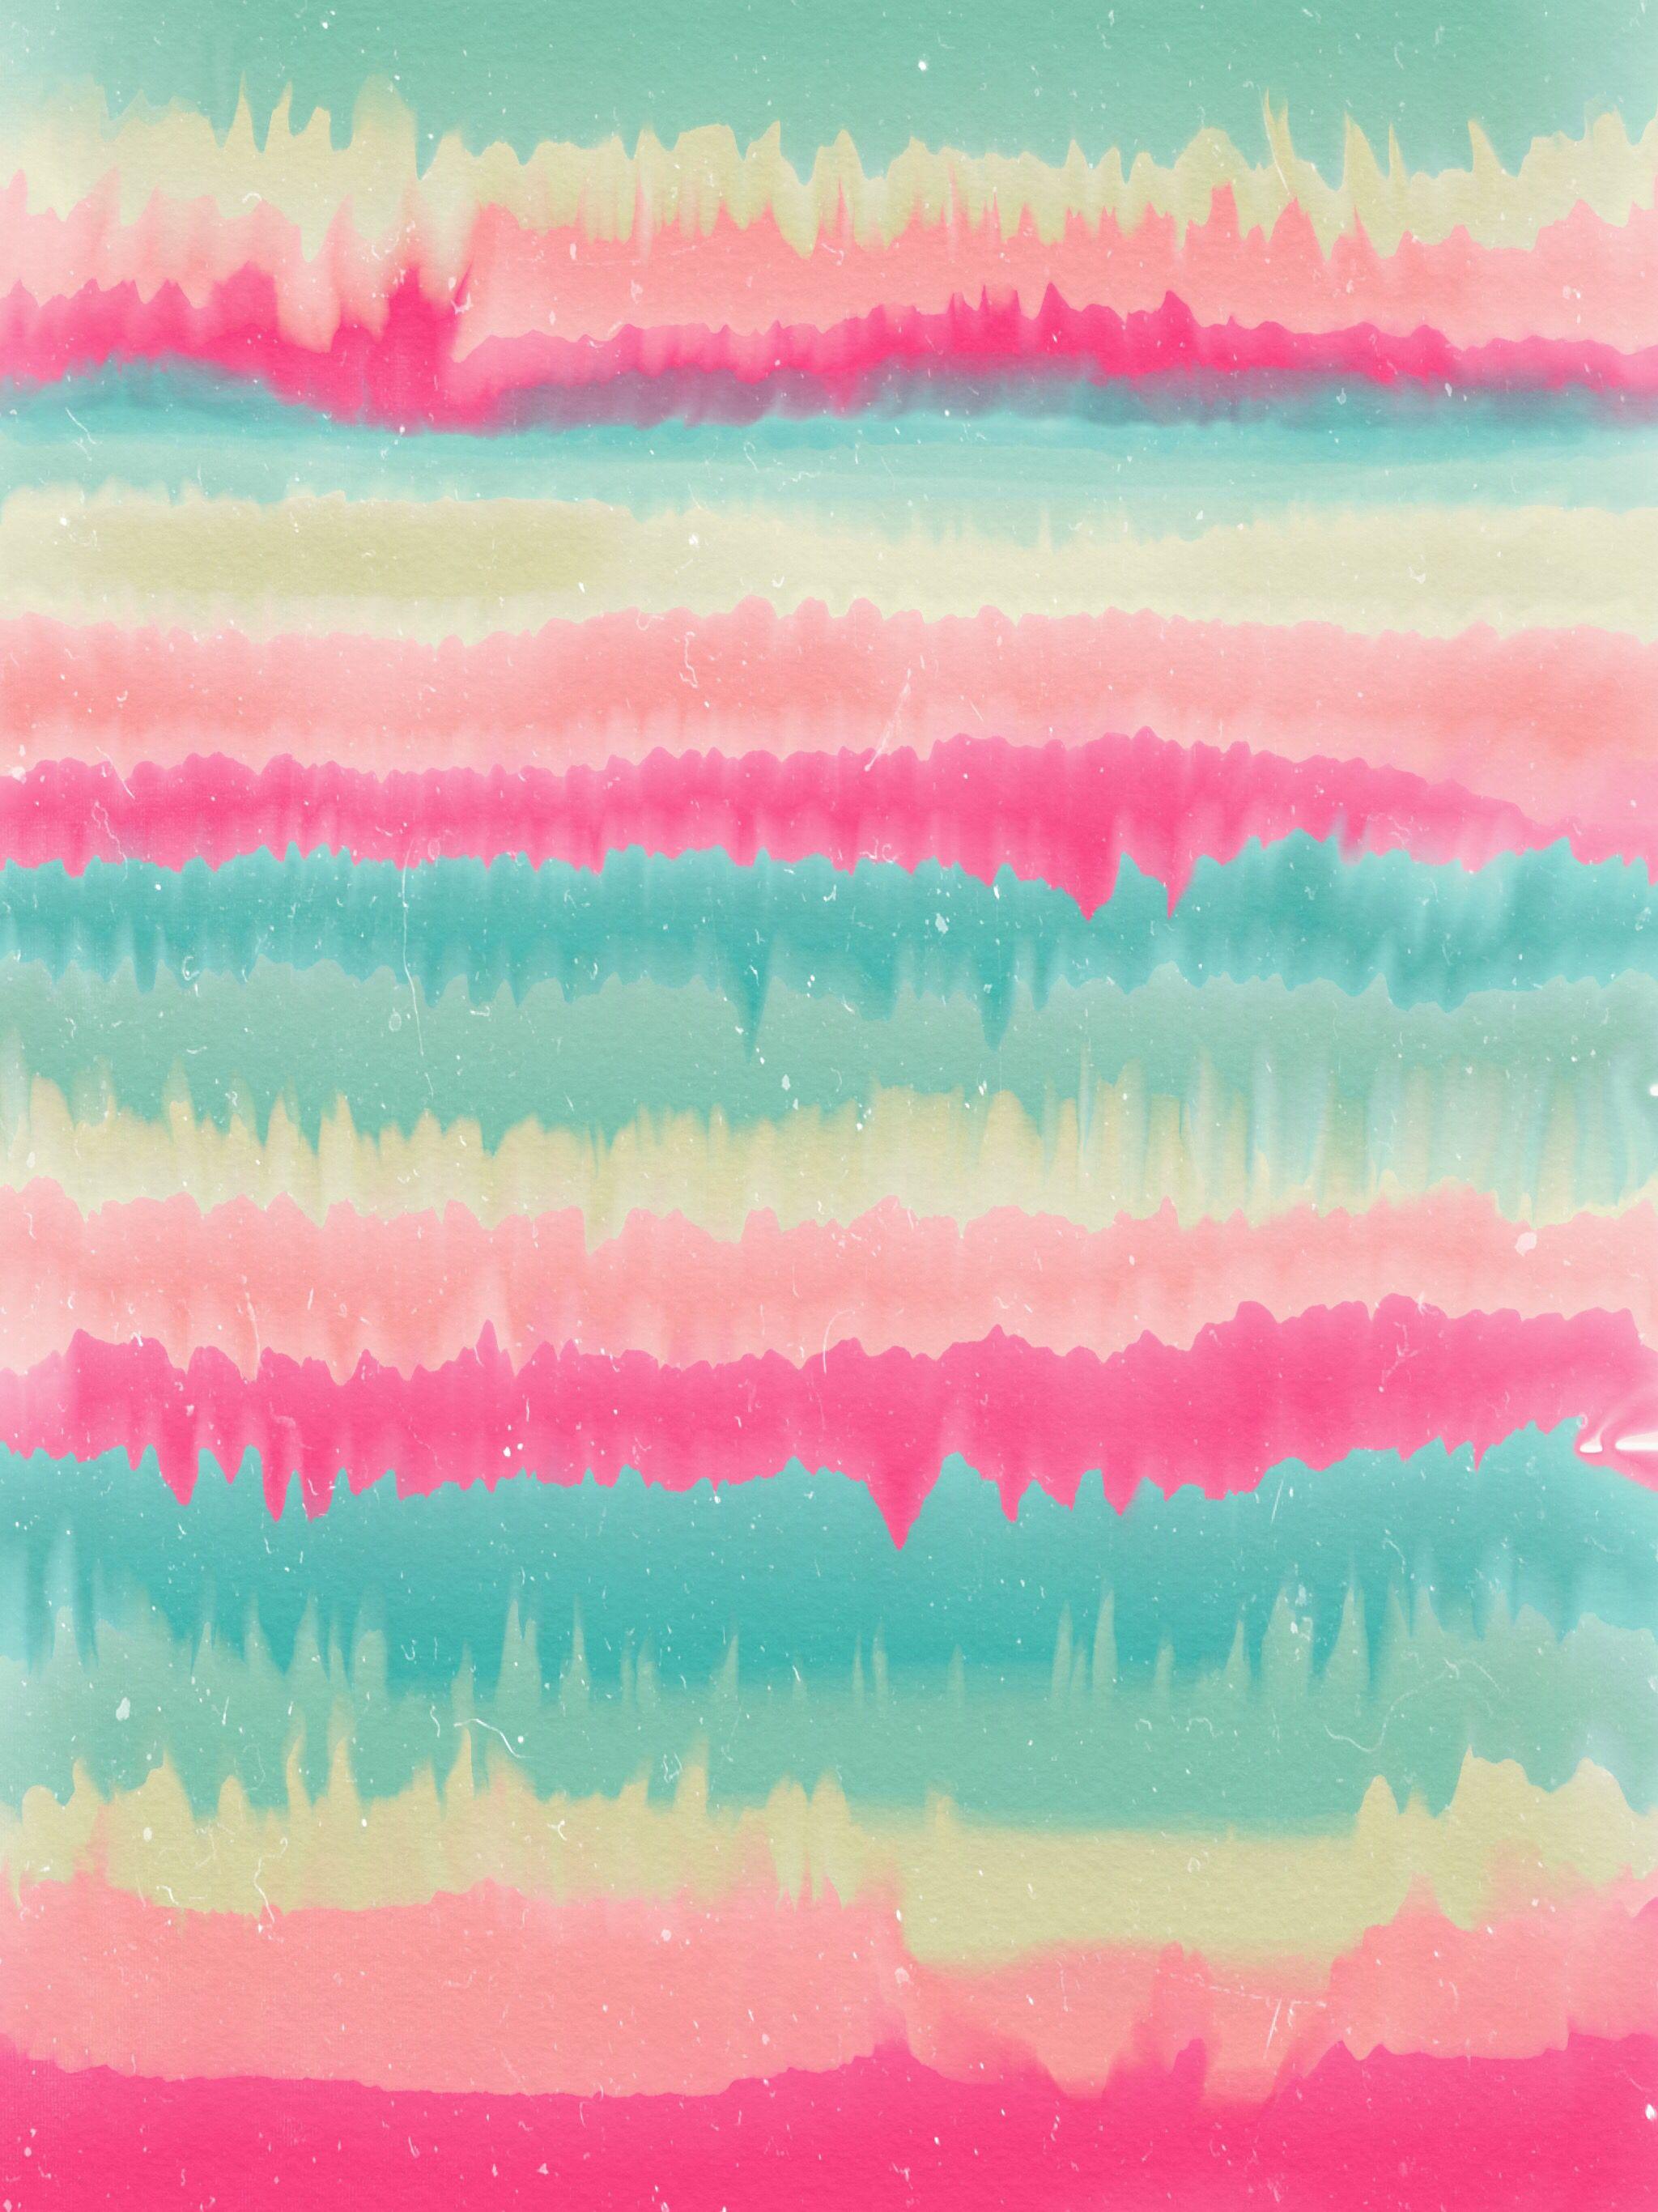 Watercolor Background Wallpaper Print Art Artprint Collage